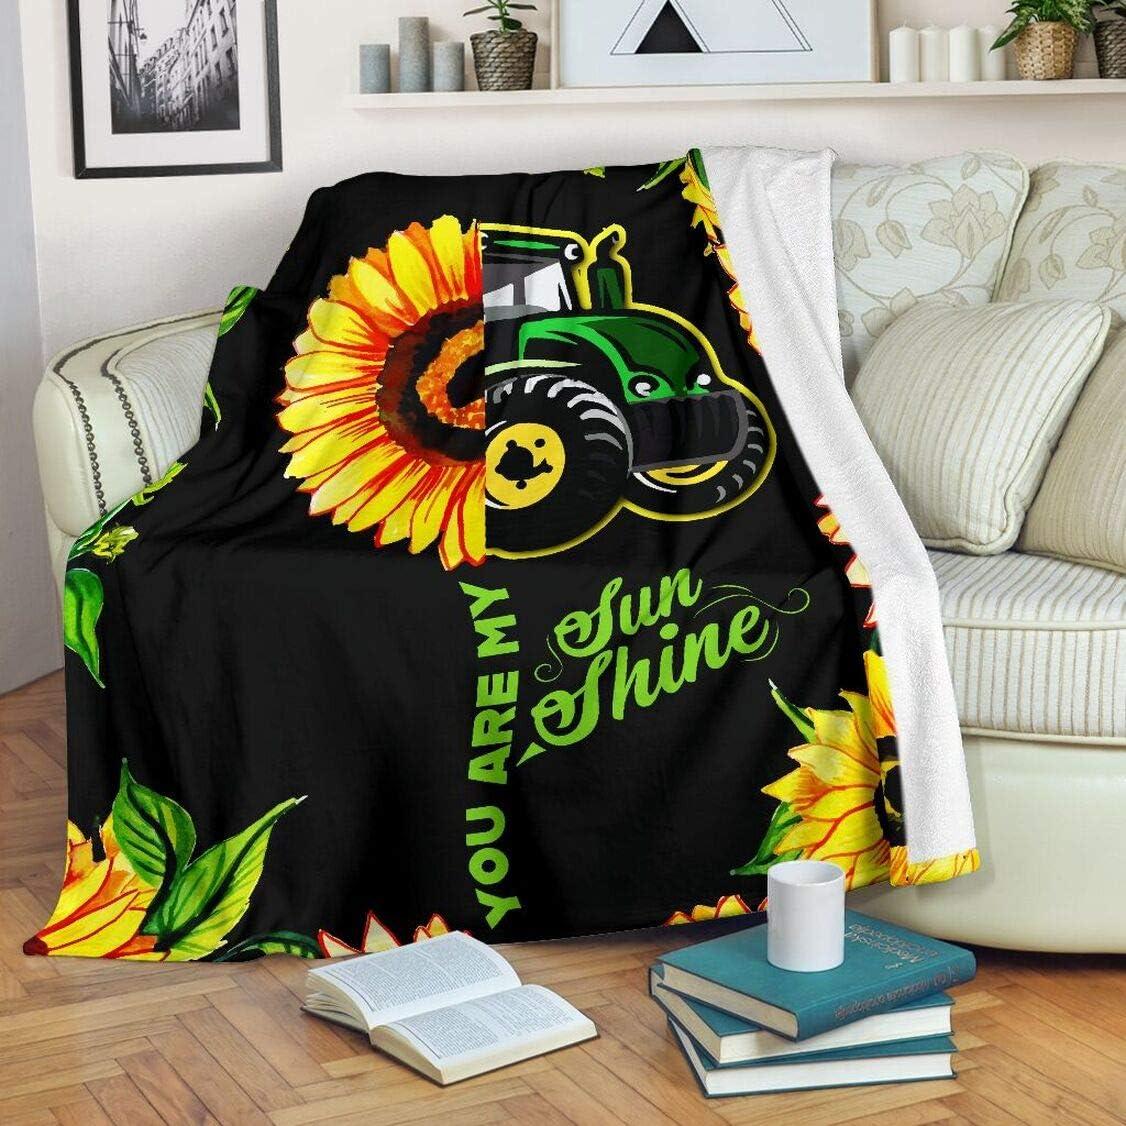 Ranking TOP20 Personalized Farmer's Wife Blanket National uniform free shipping P Fuzzy Sherpa Fleece